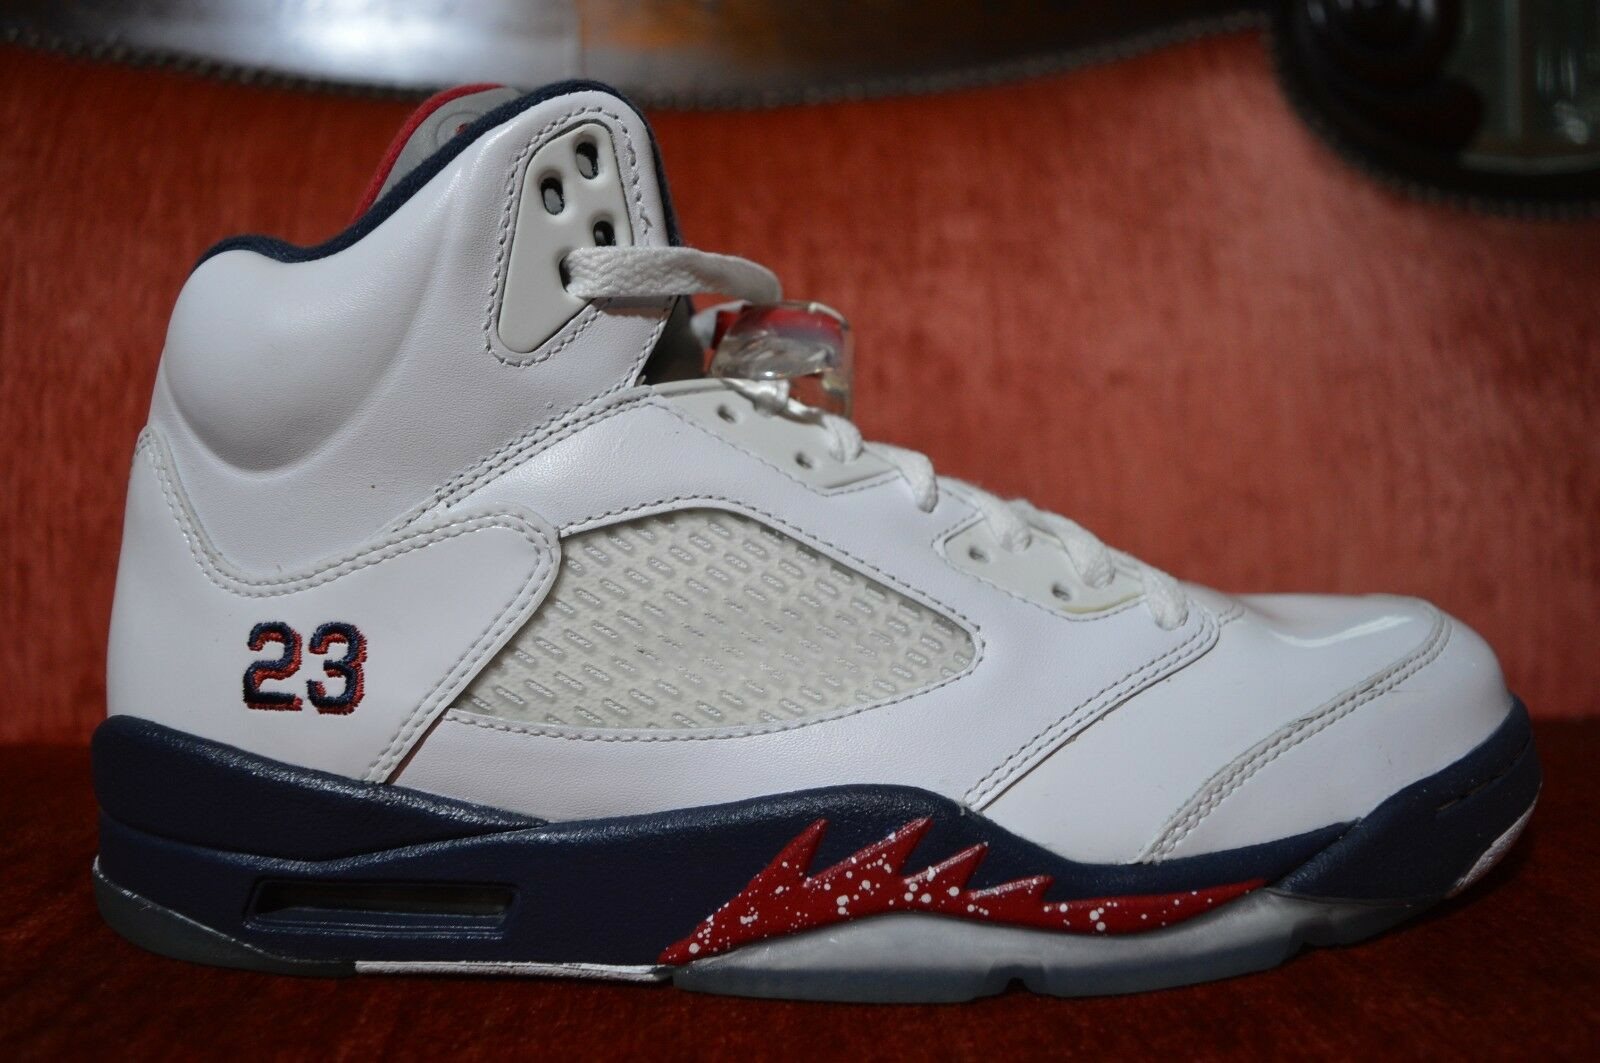 Nike air jordan 5 v 'pulita olympic usa 136027-103 taglia 10 rosso - bianco - blu